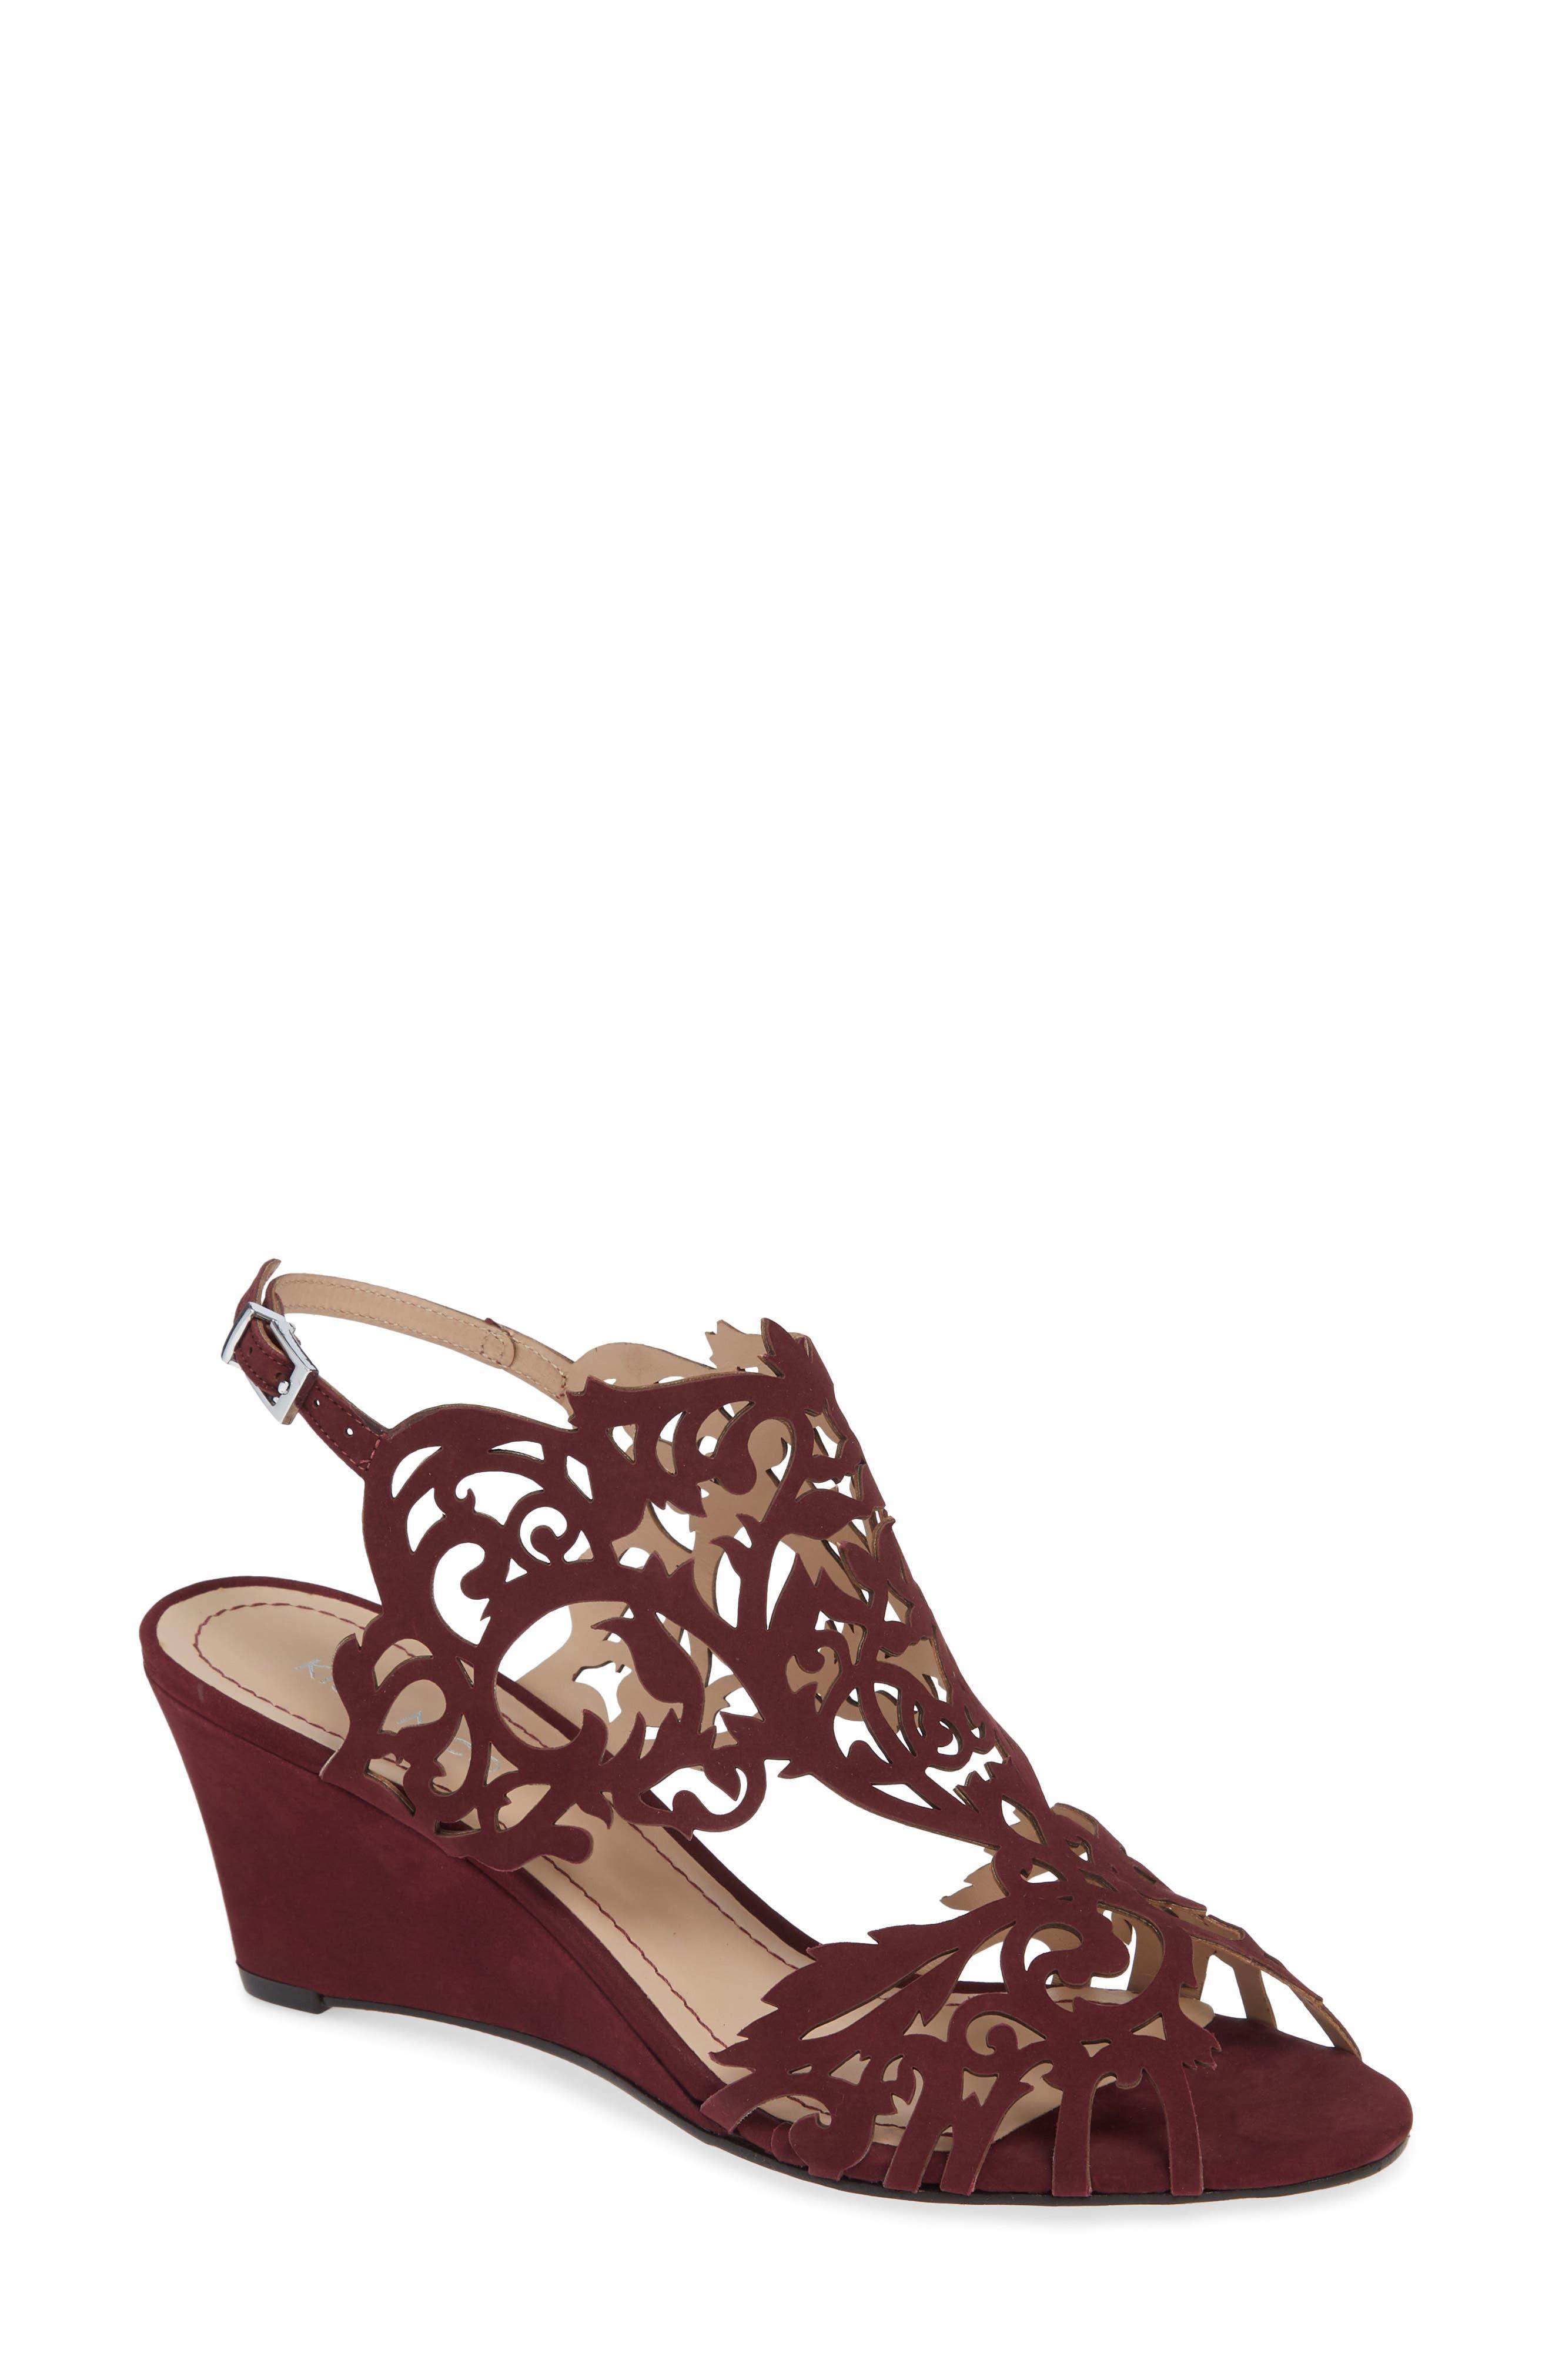 Marcela Laser Cutout Wedge Sandal,                         Main,                         color, WINE LEATHER